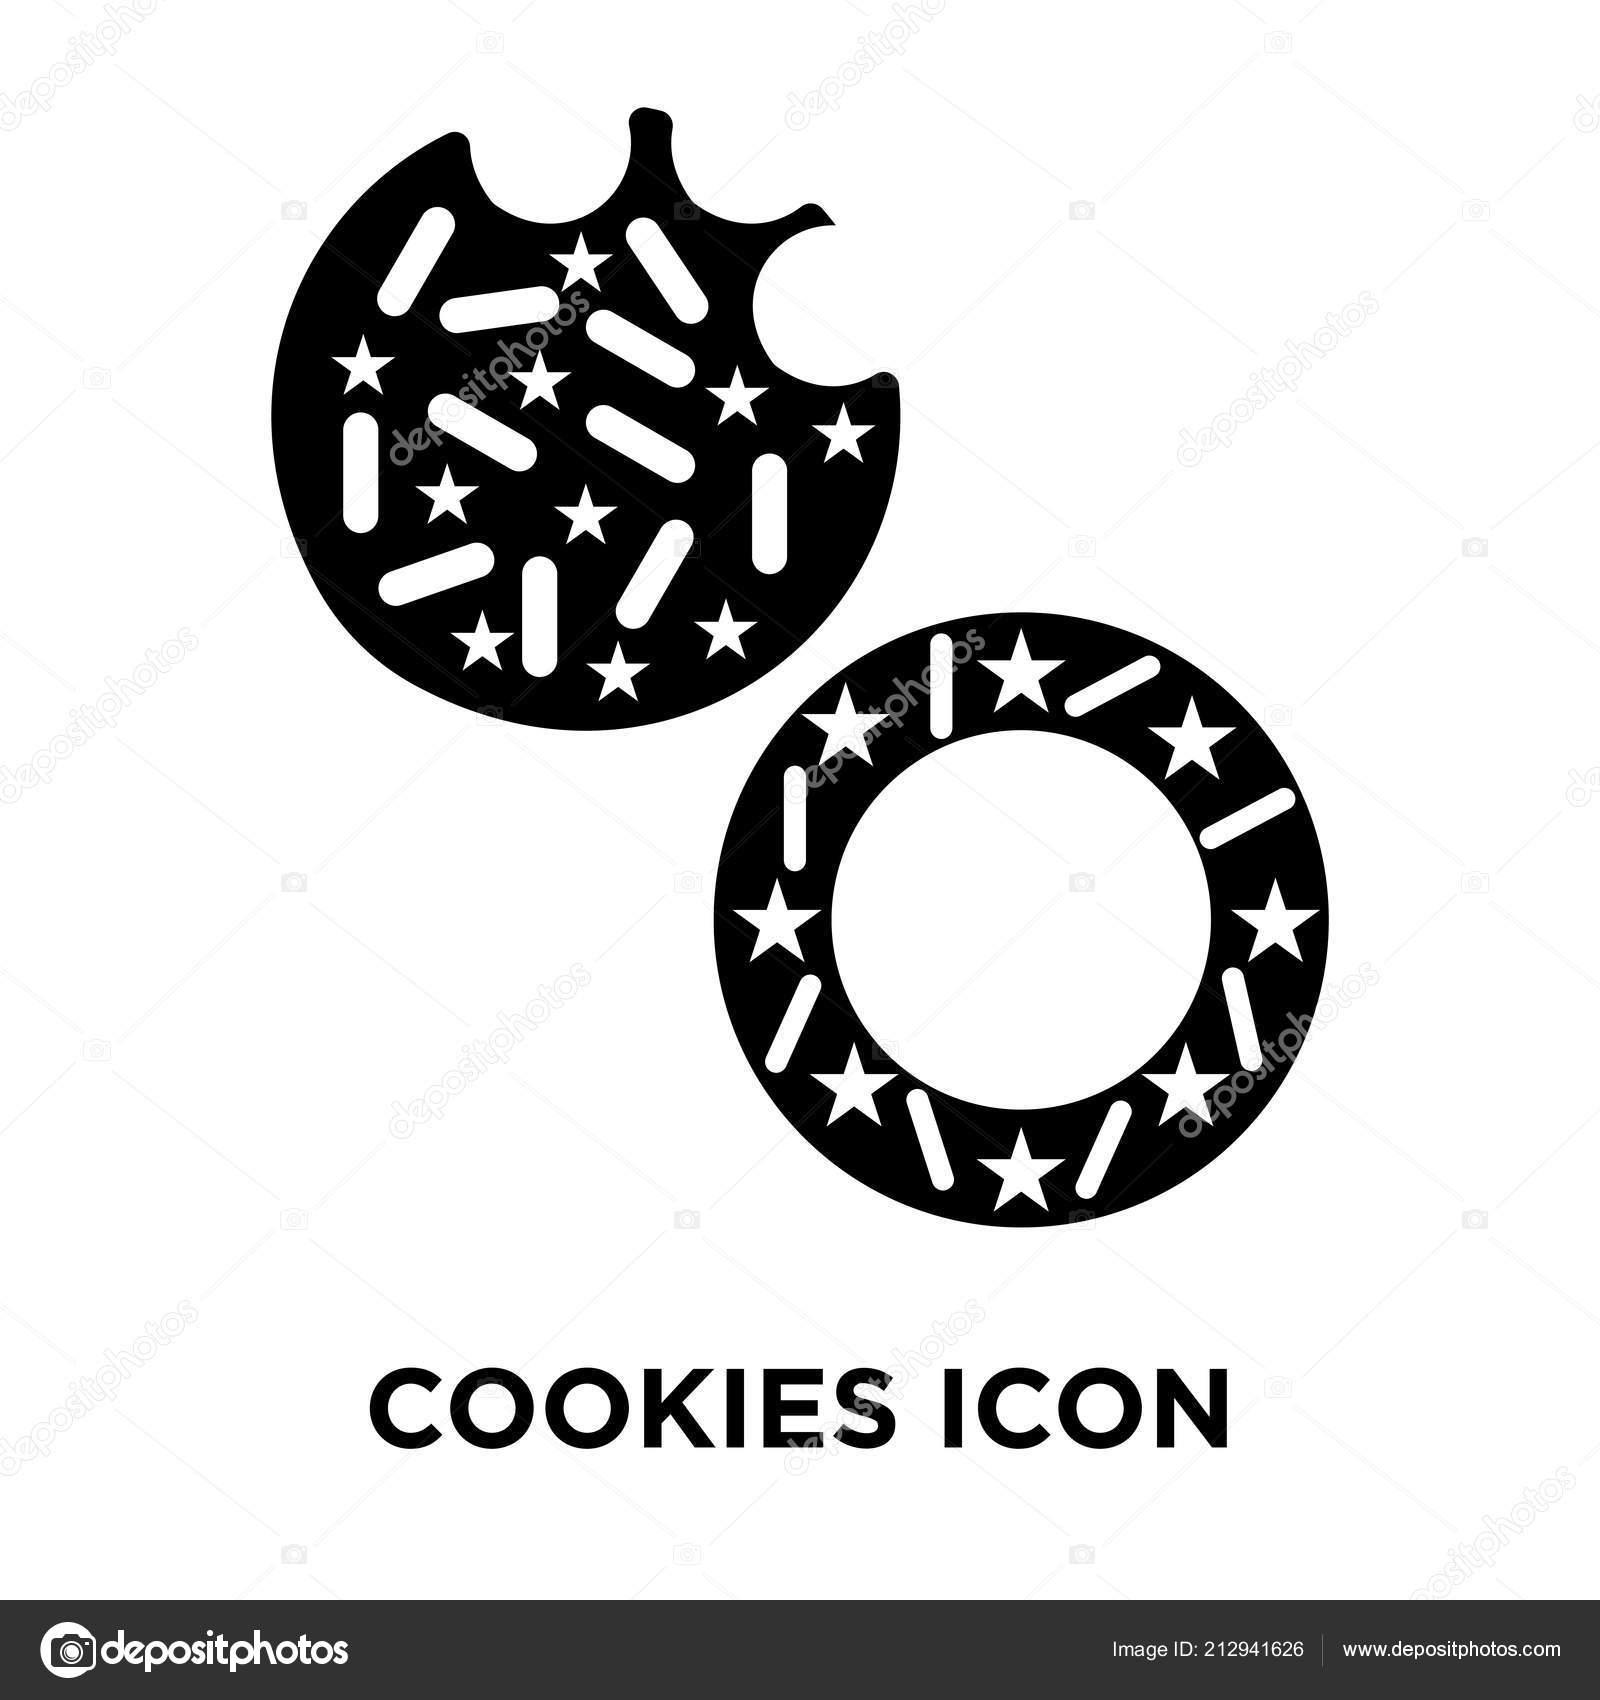 icon cookies cookies icon vector isolated white background logo concept cookies sign stock vector c topvectorstock 212941626 depositphotos